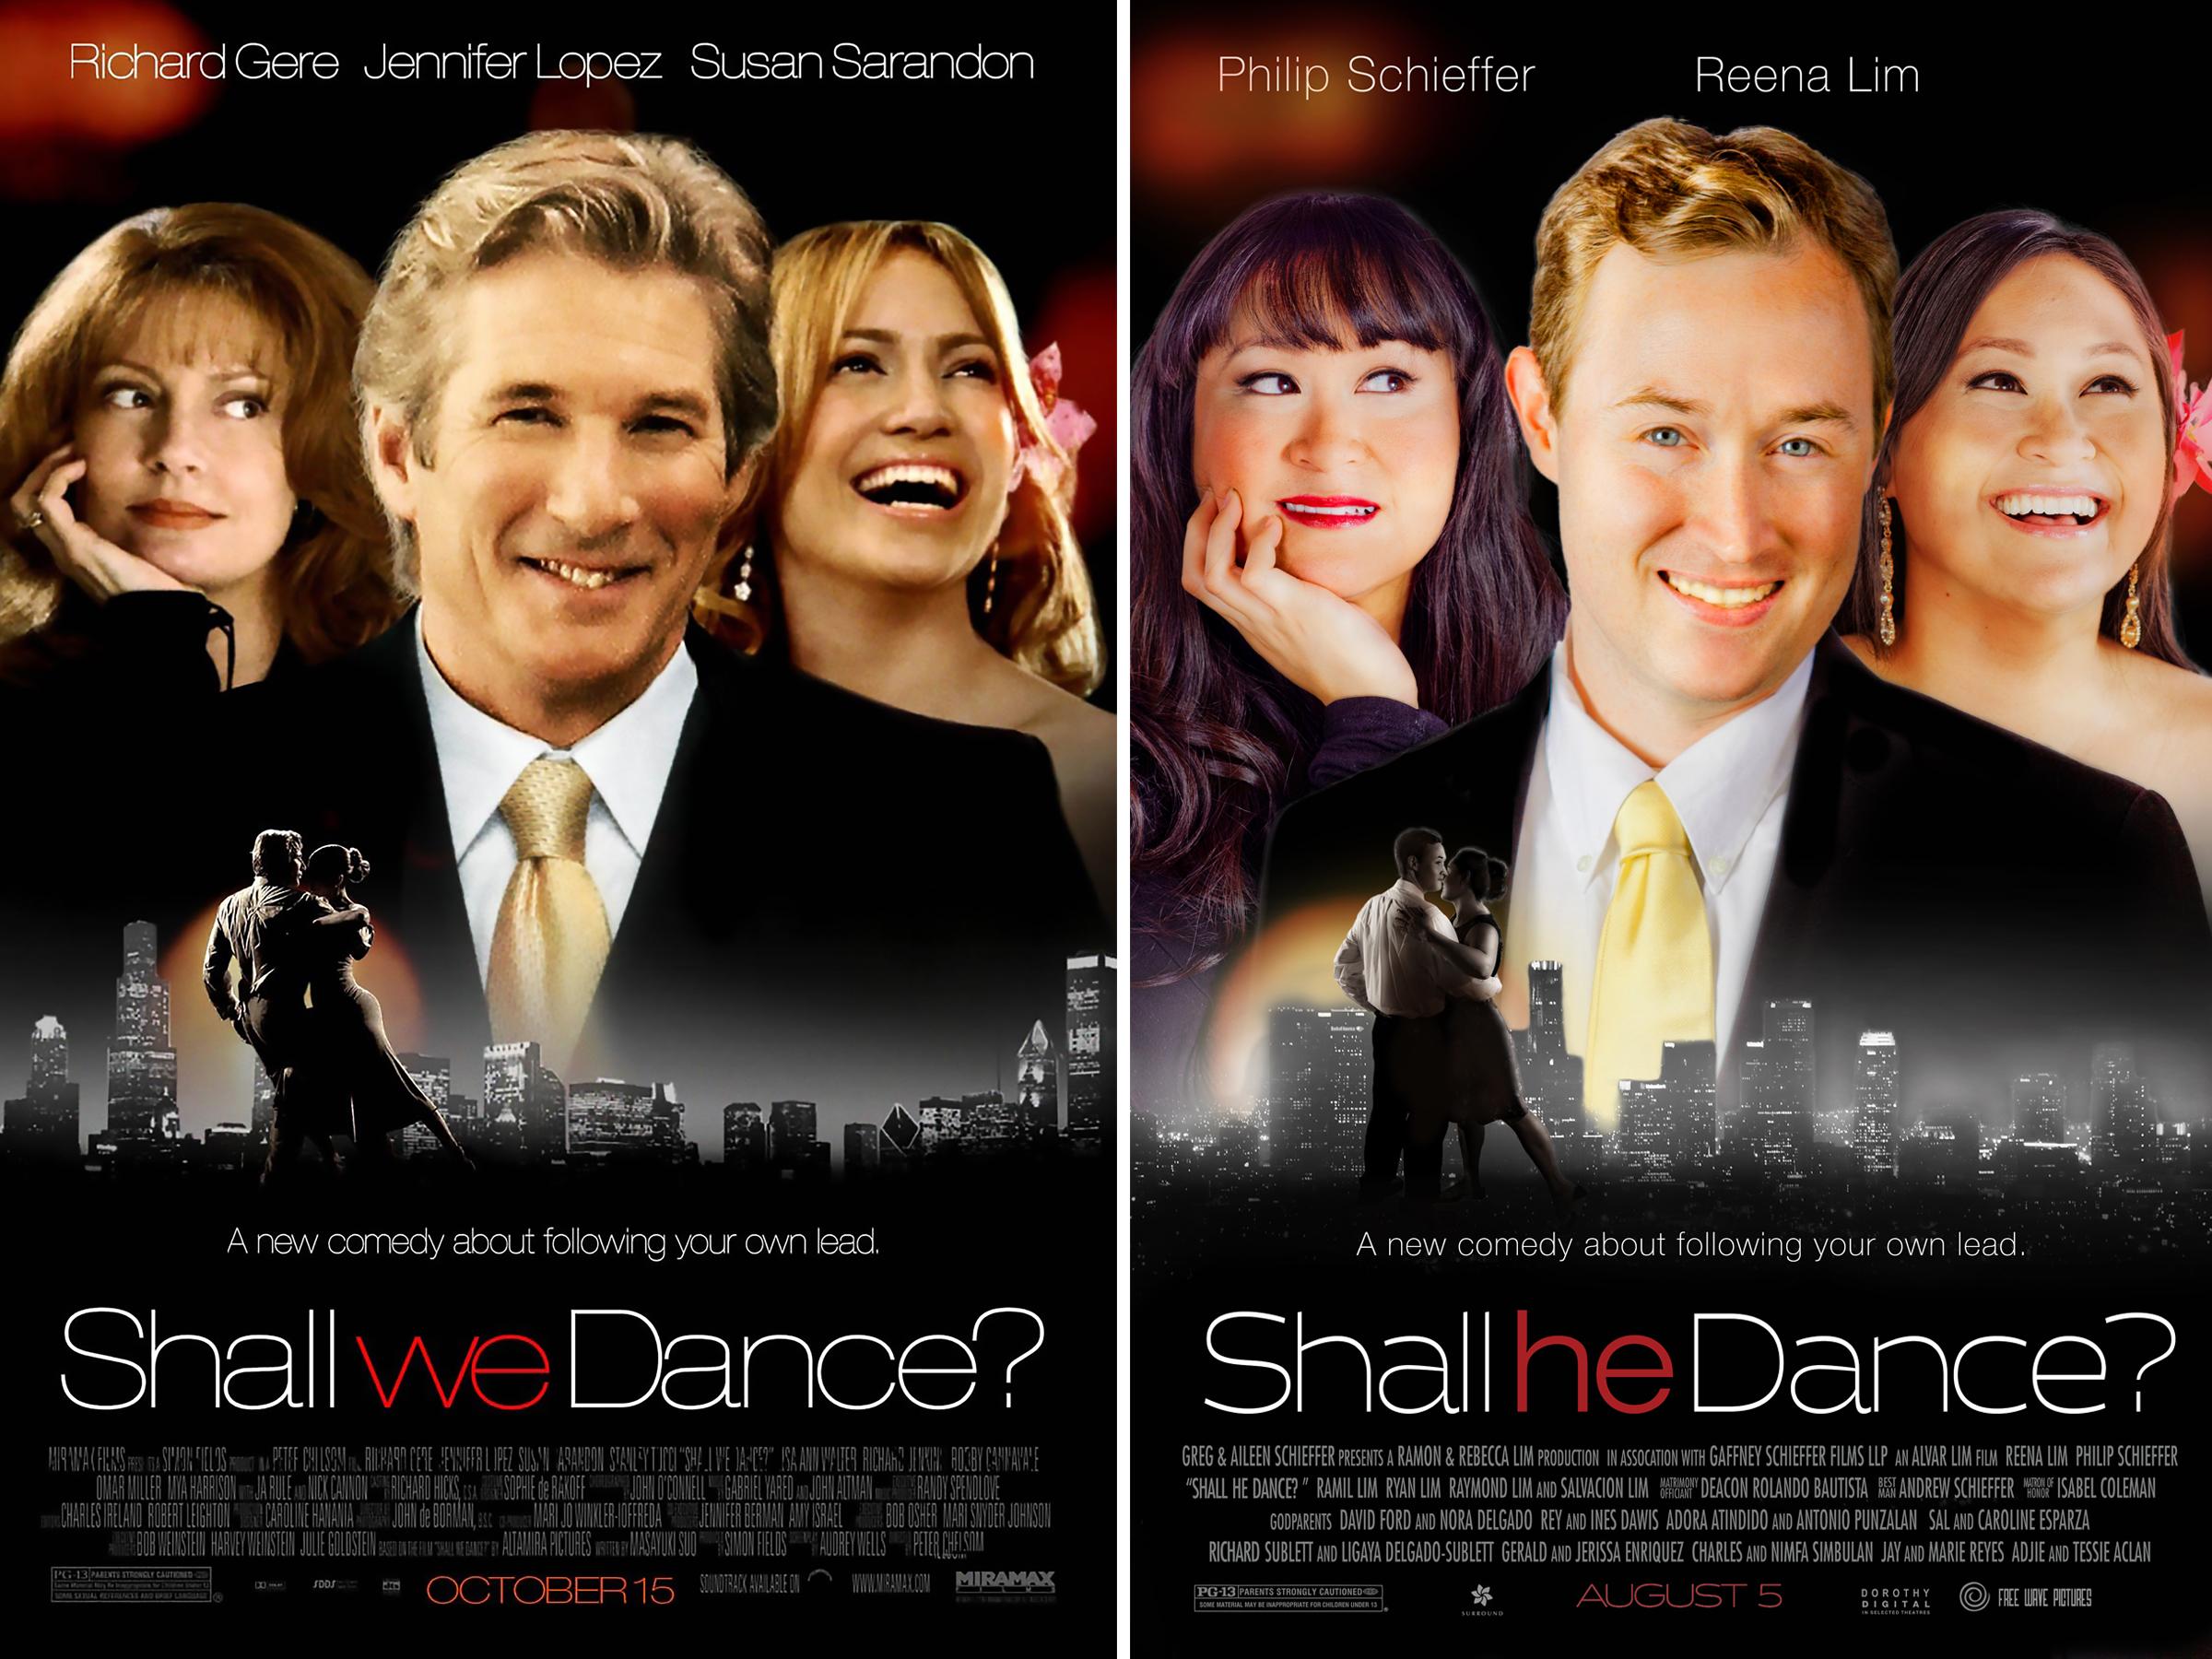 Shall_he_dance_duo